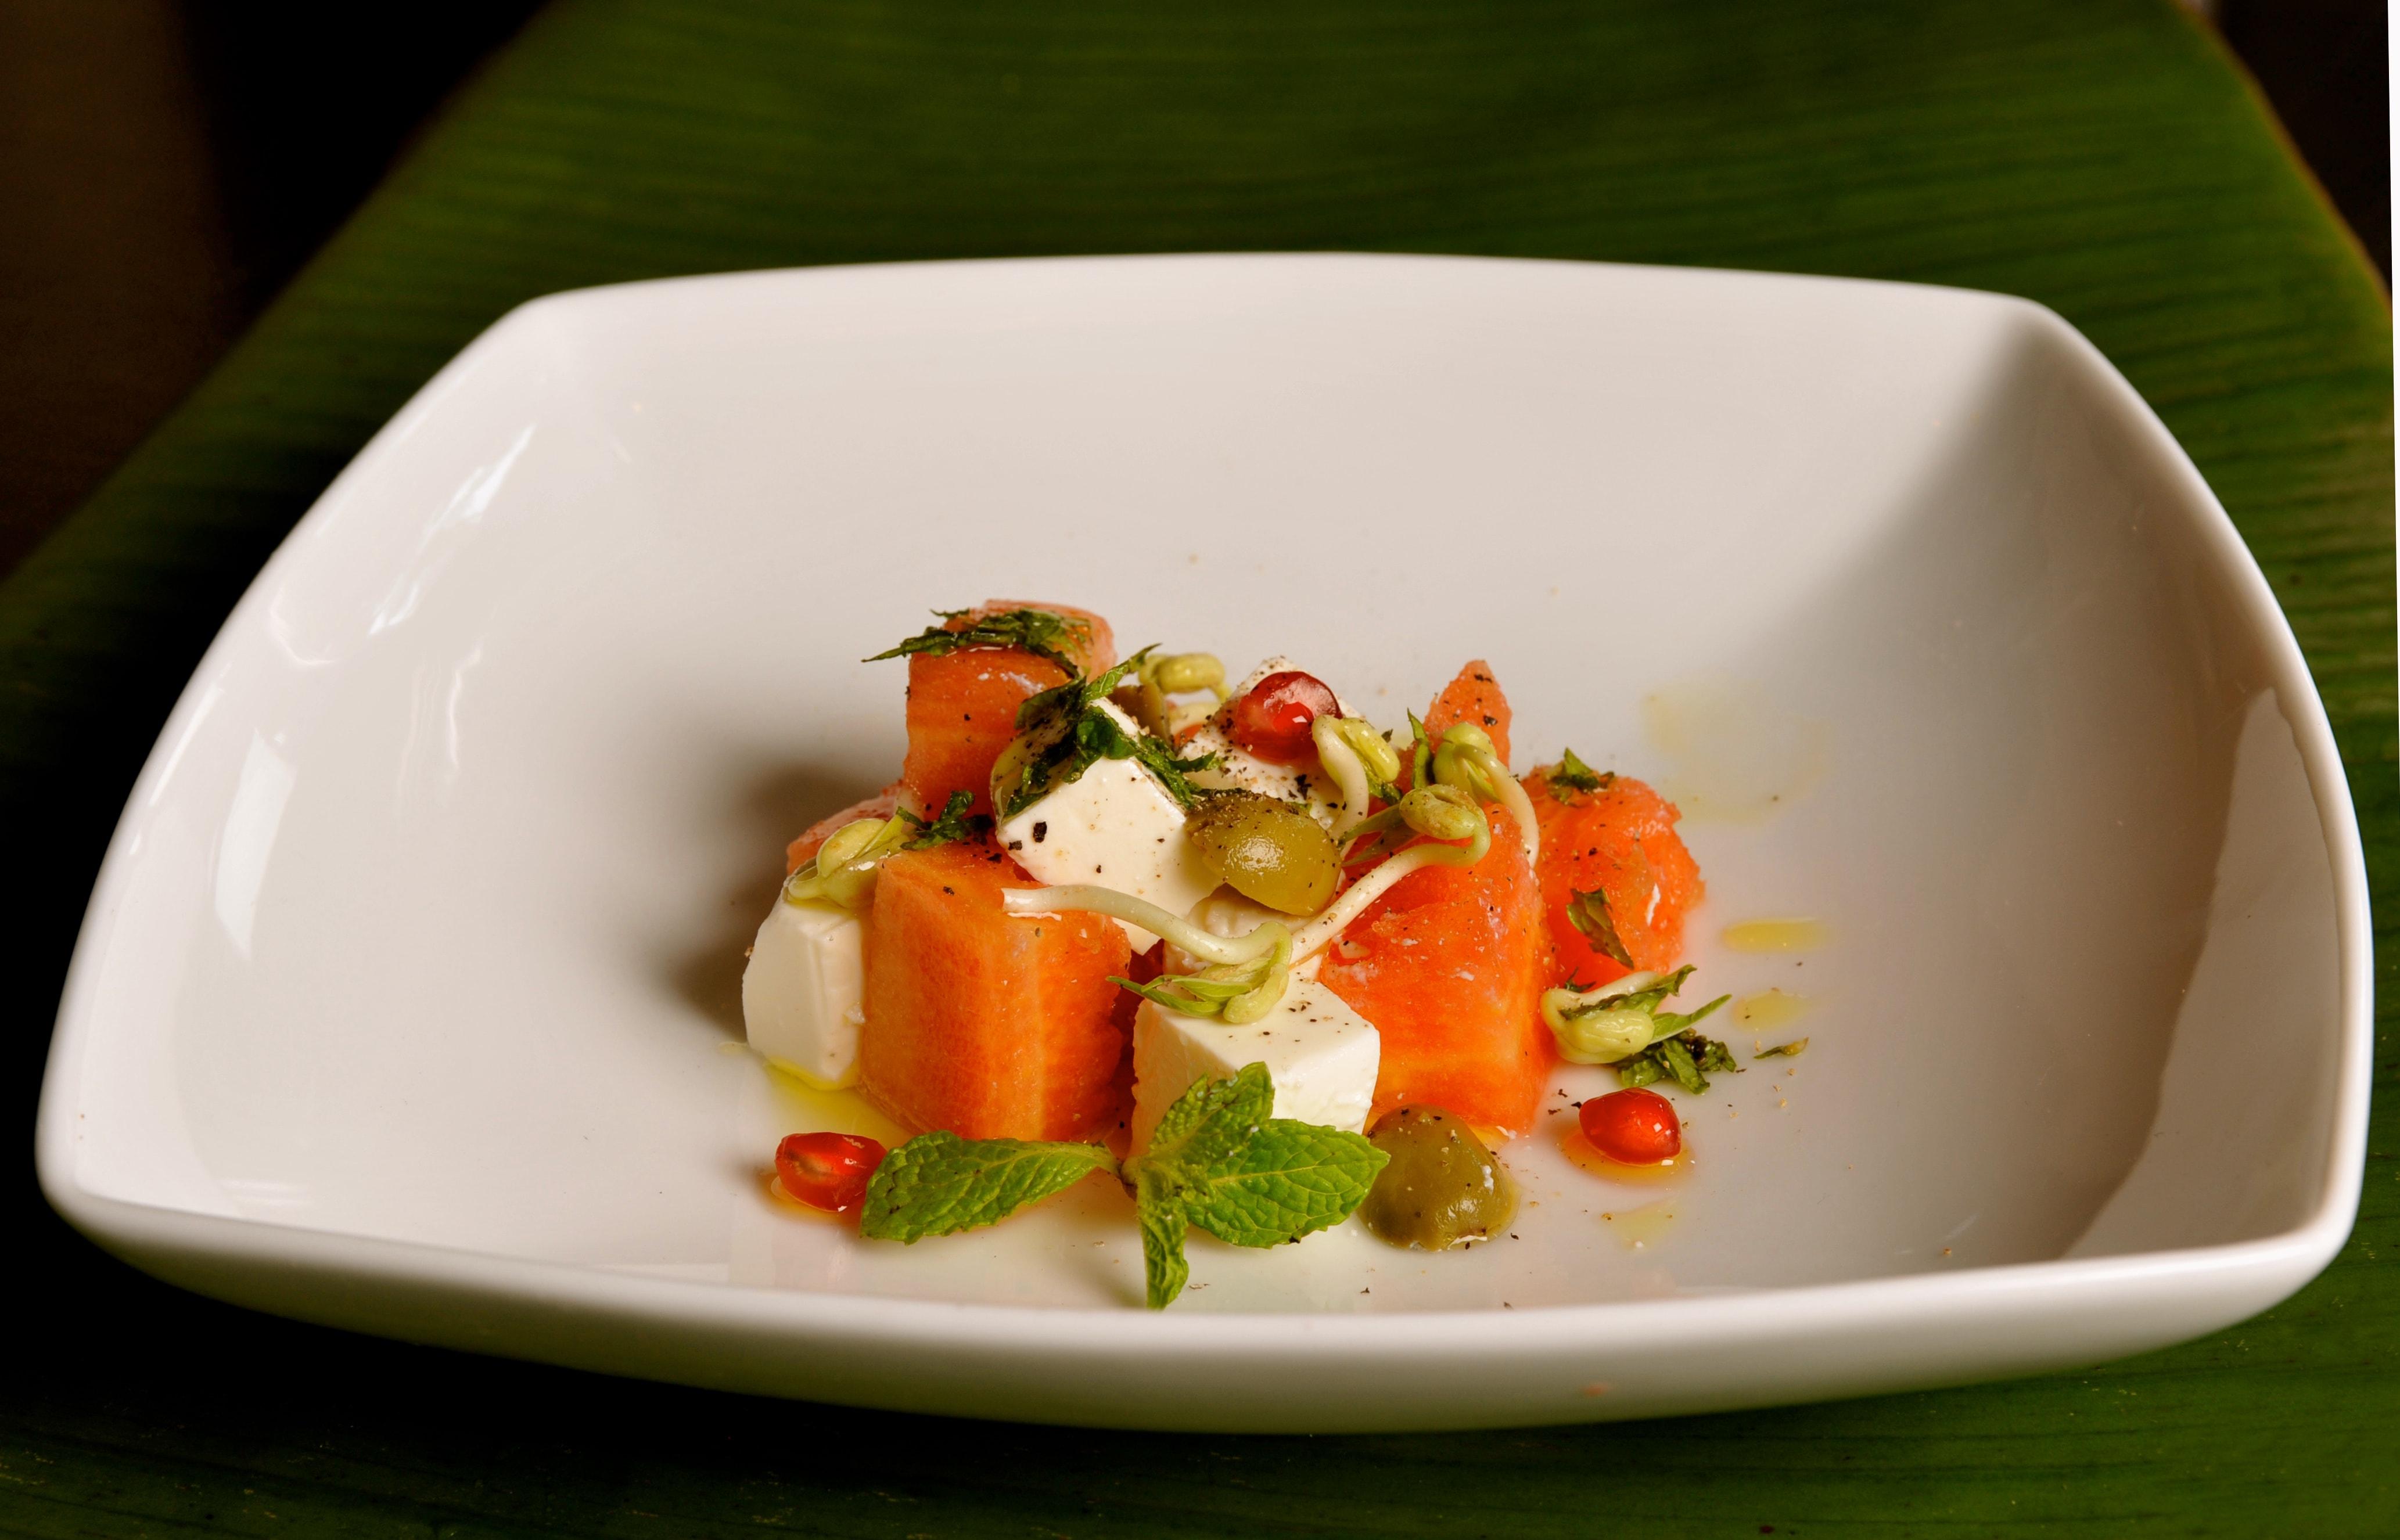 Olive-fetta-watermelon-salad©JennyCollins - Version 2